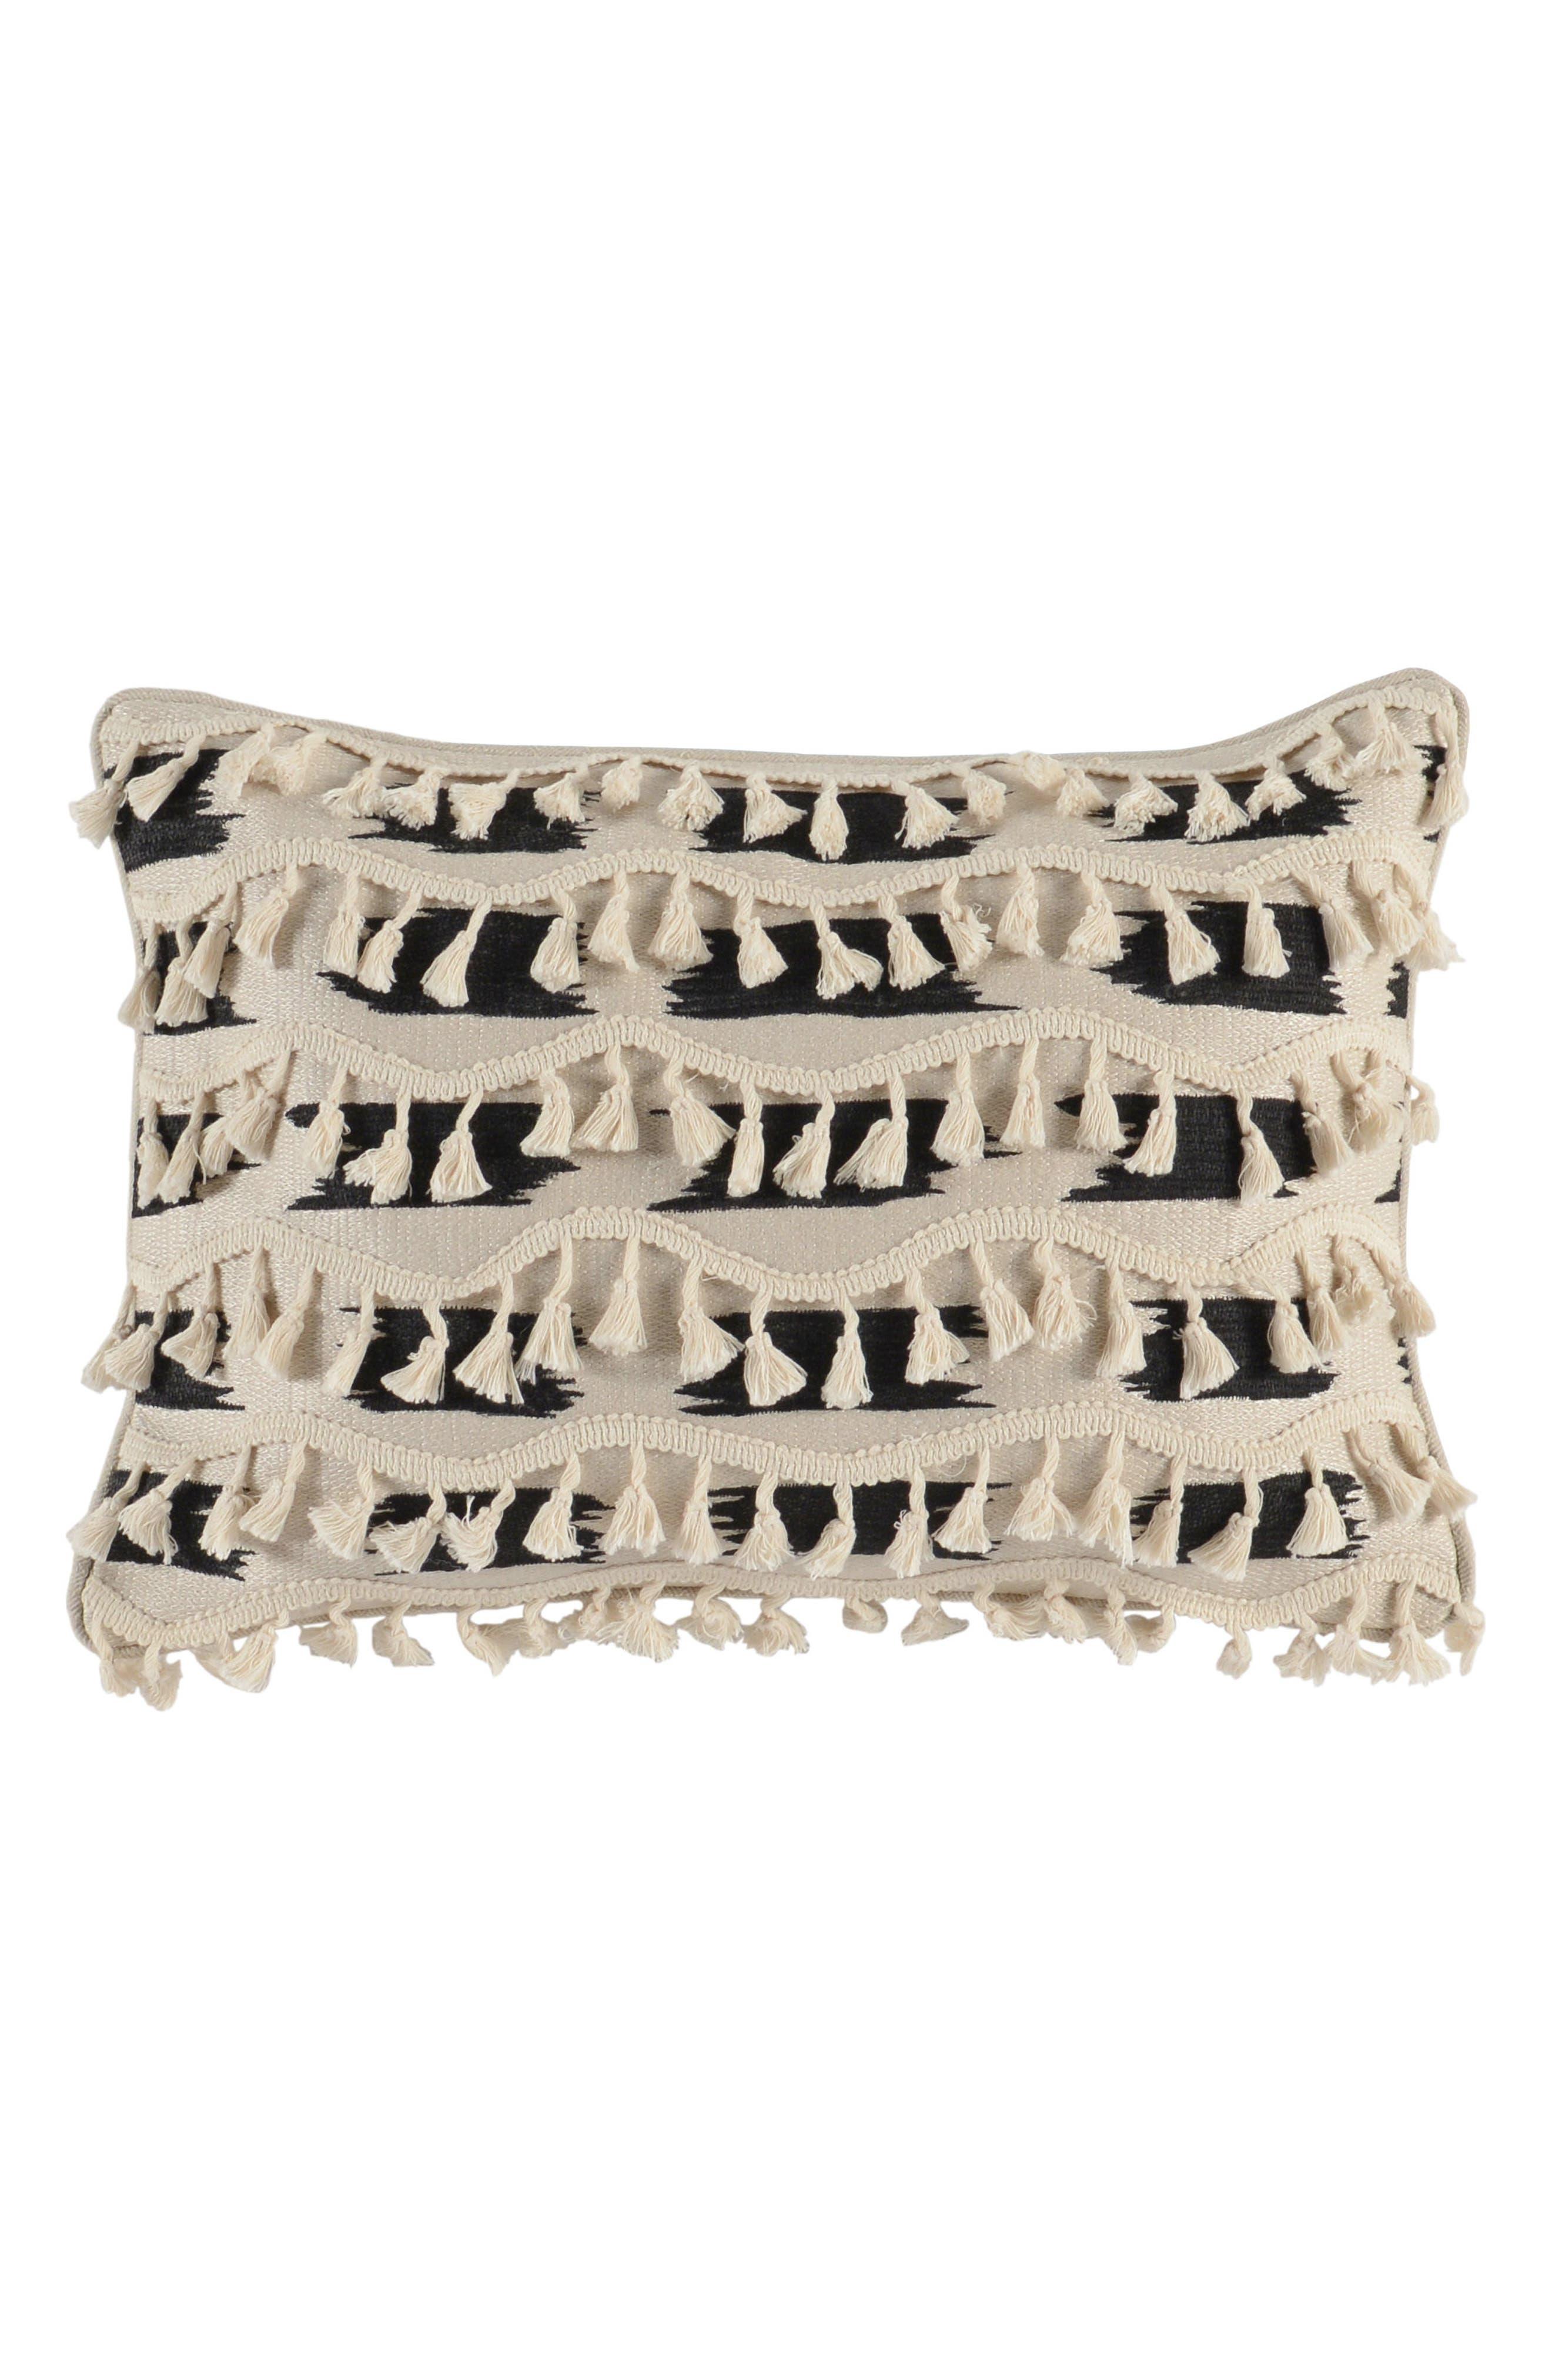 Villa Home Collection Roset Accent Pillow